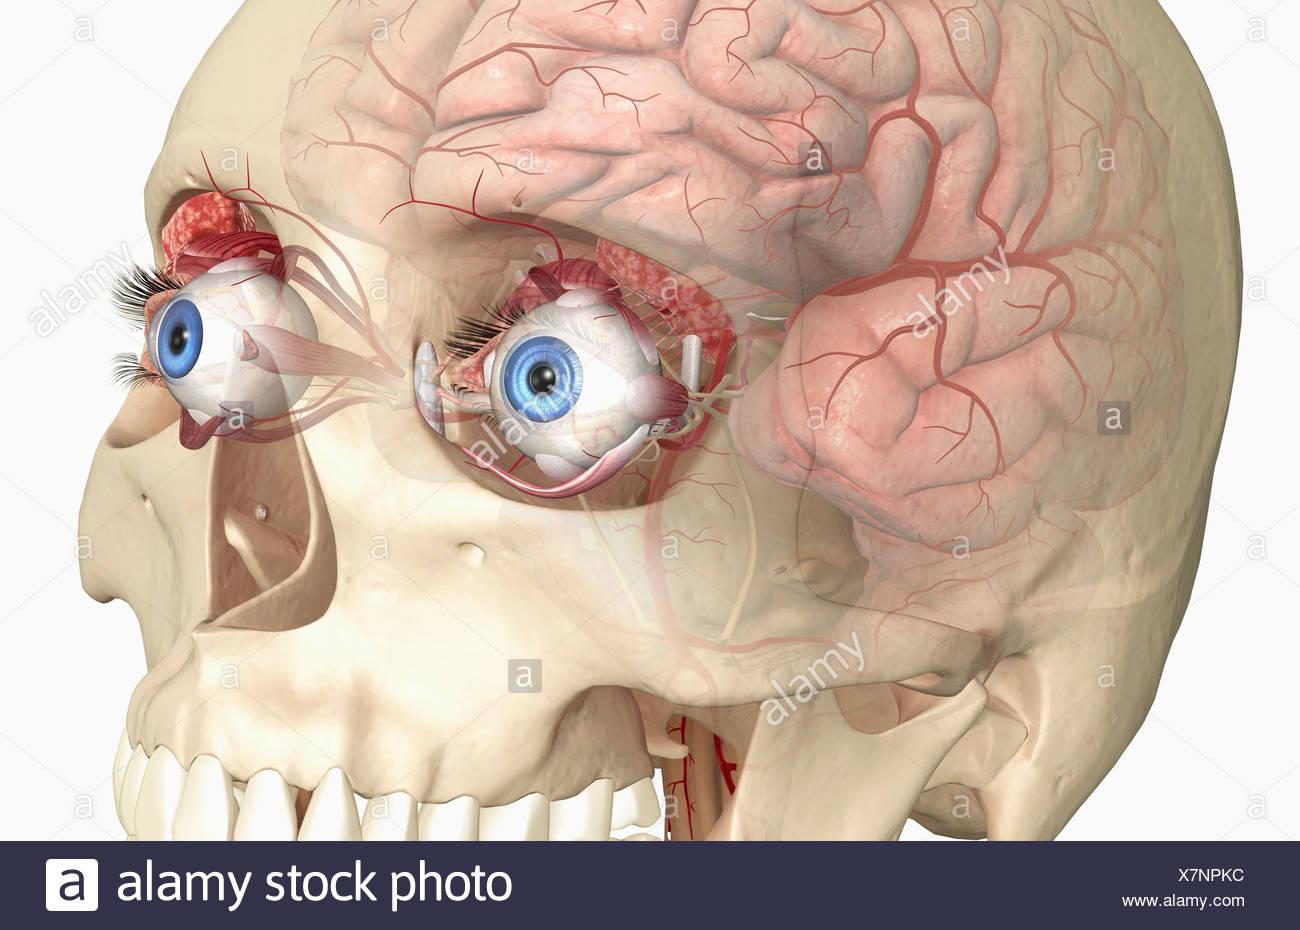 The lacrimal apparatus Stock Photo: 280147264 - Alamy